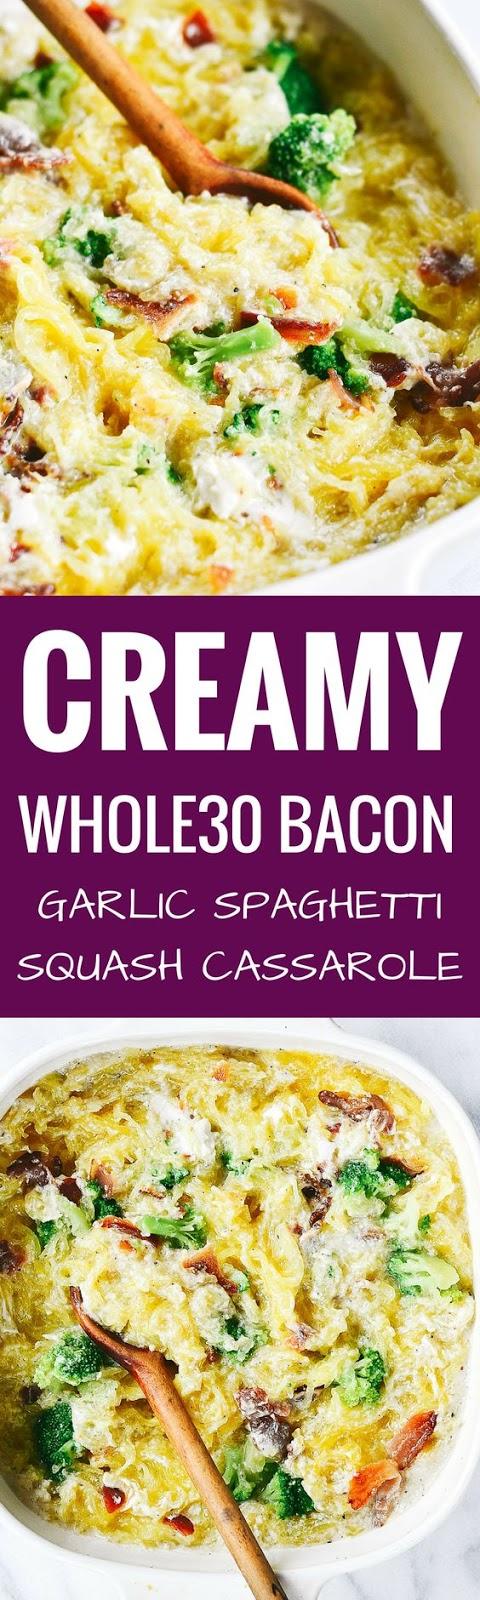 Creamy Whole30 Bacon Garlic Spaghetti Squash